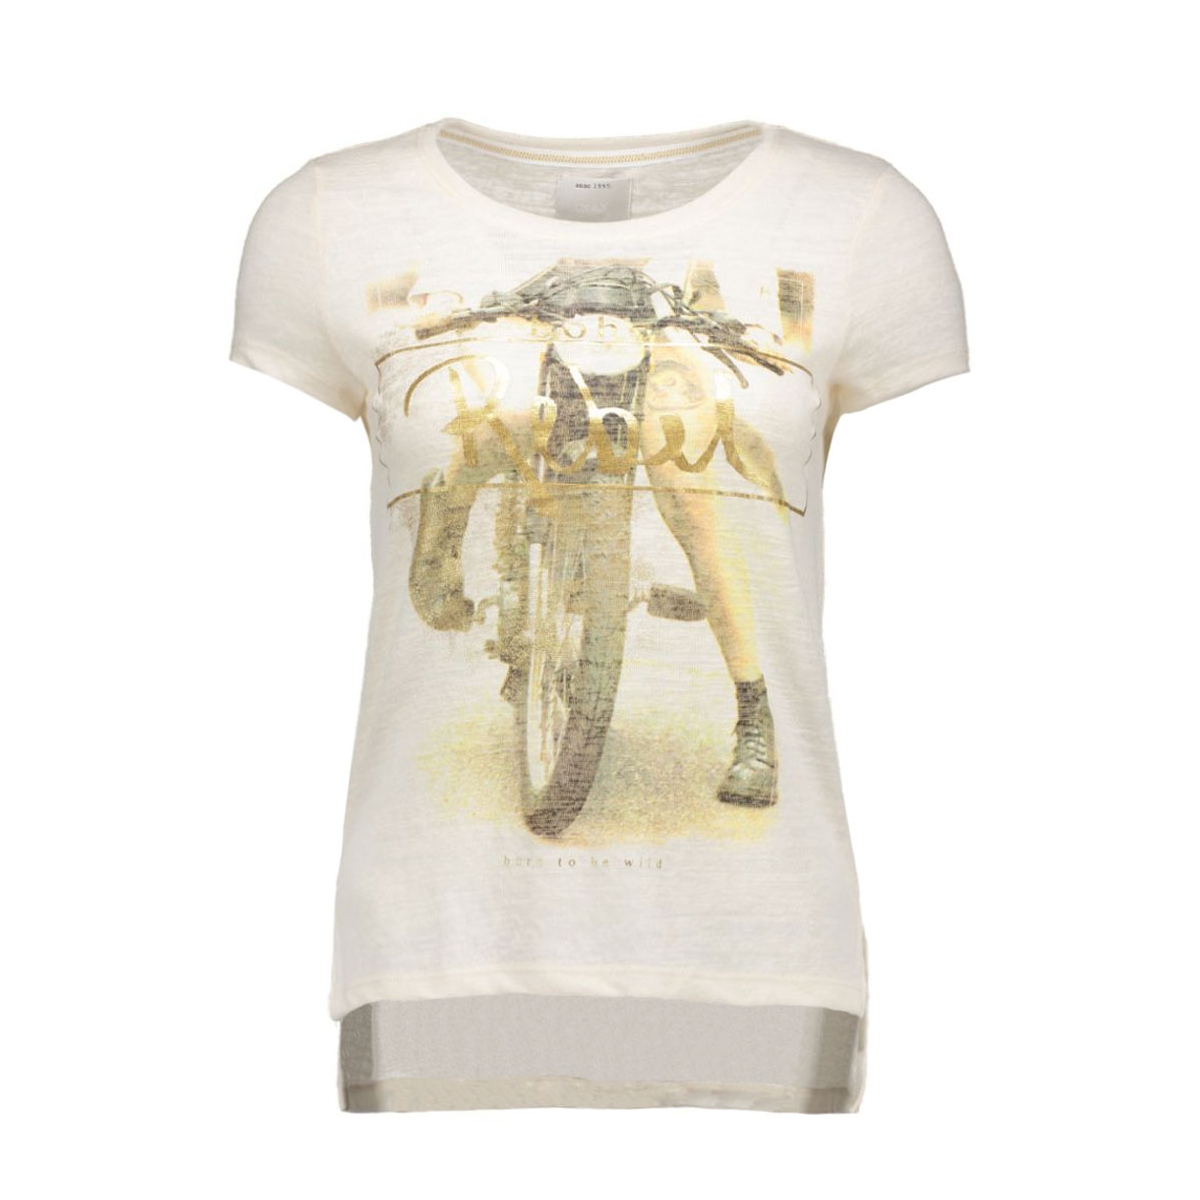 onlgloria s/s rebel/love top box es 15118268 only t-shirt whisper white/rebel